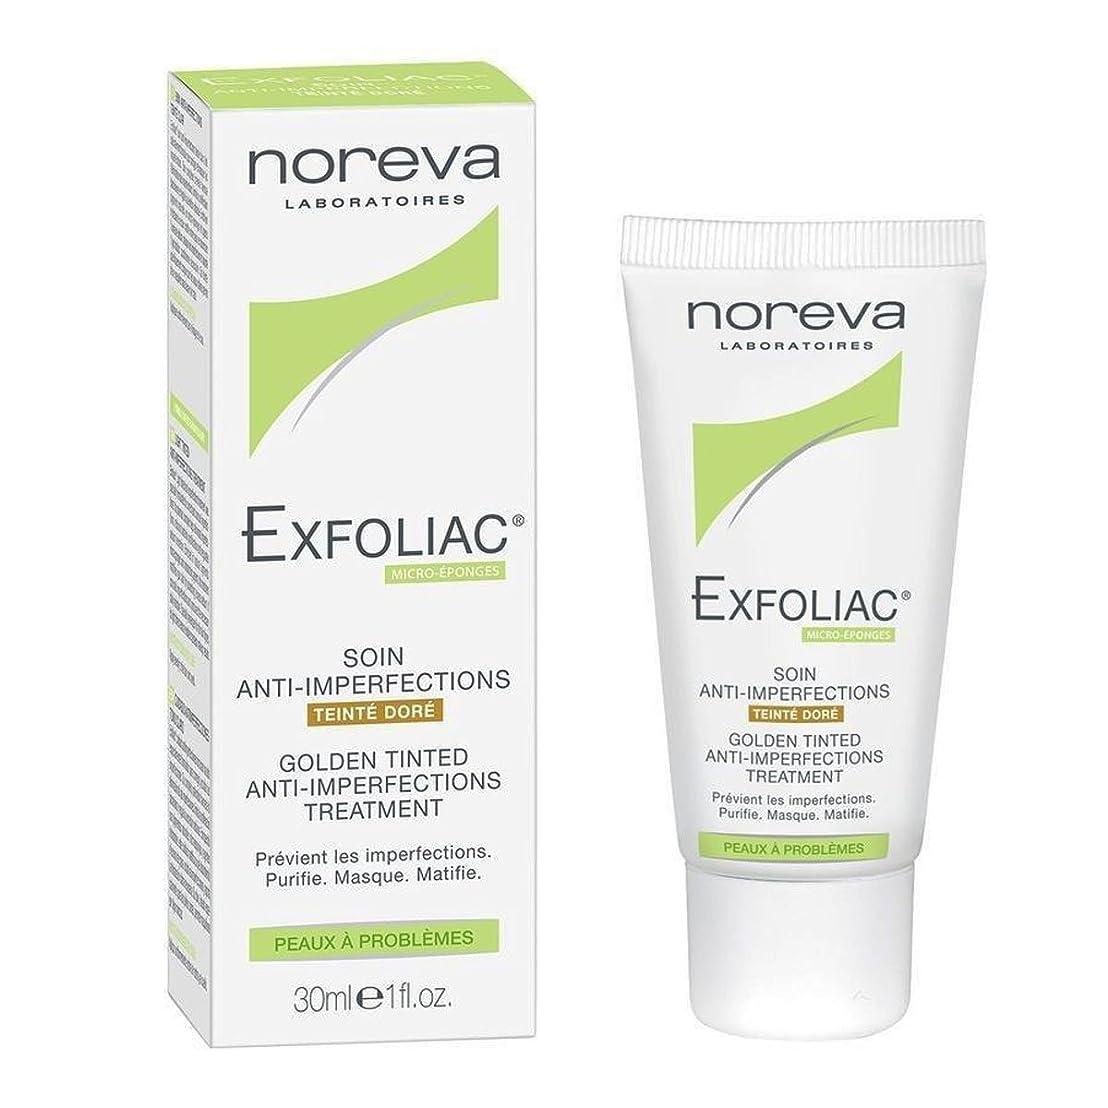 Noreva Exfoliac Anti-imperfections Care Golden Tinted 30ml [並行輸入品]